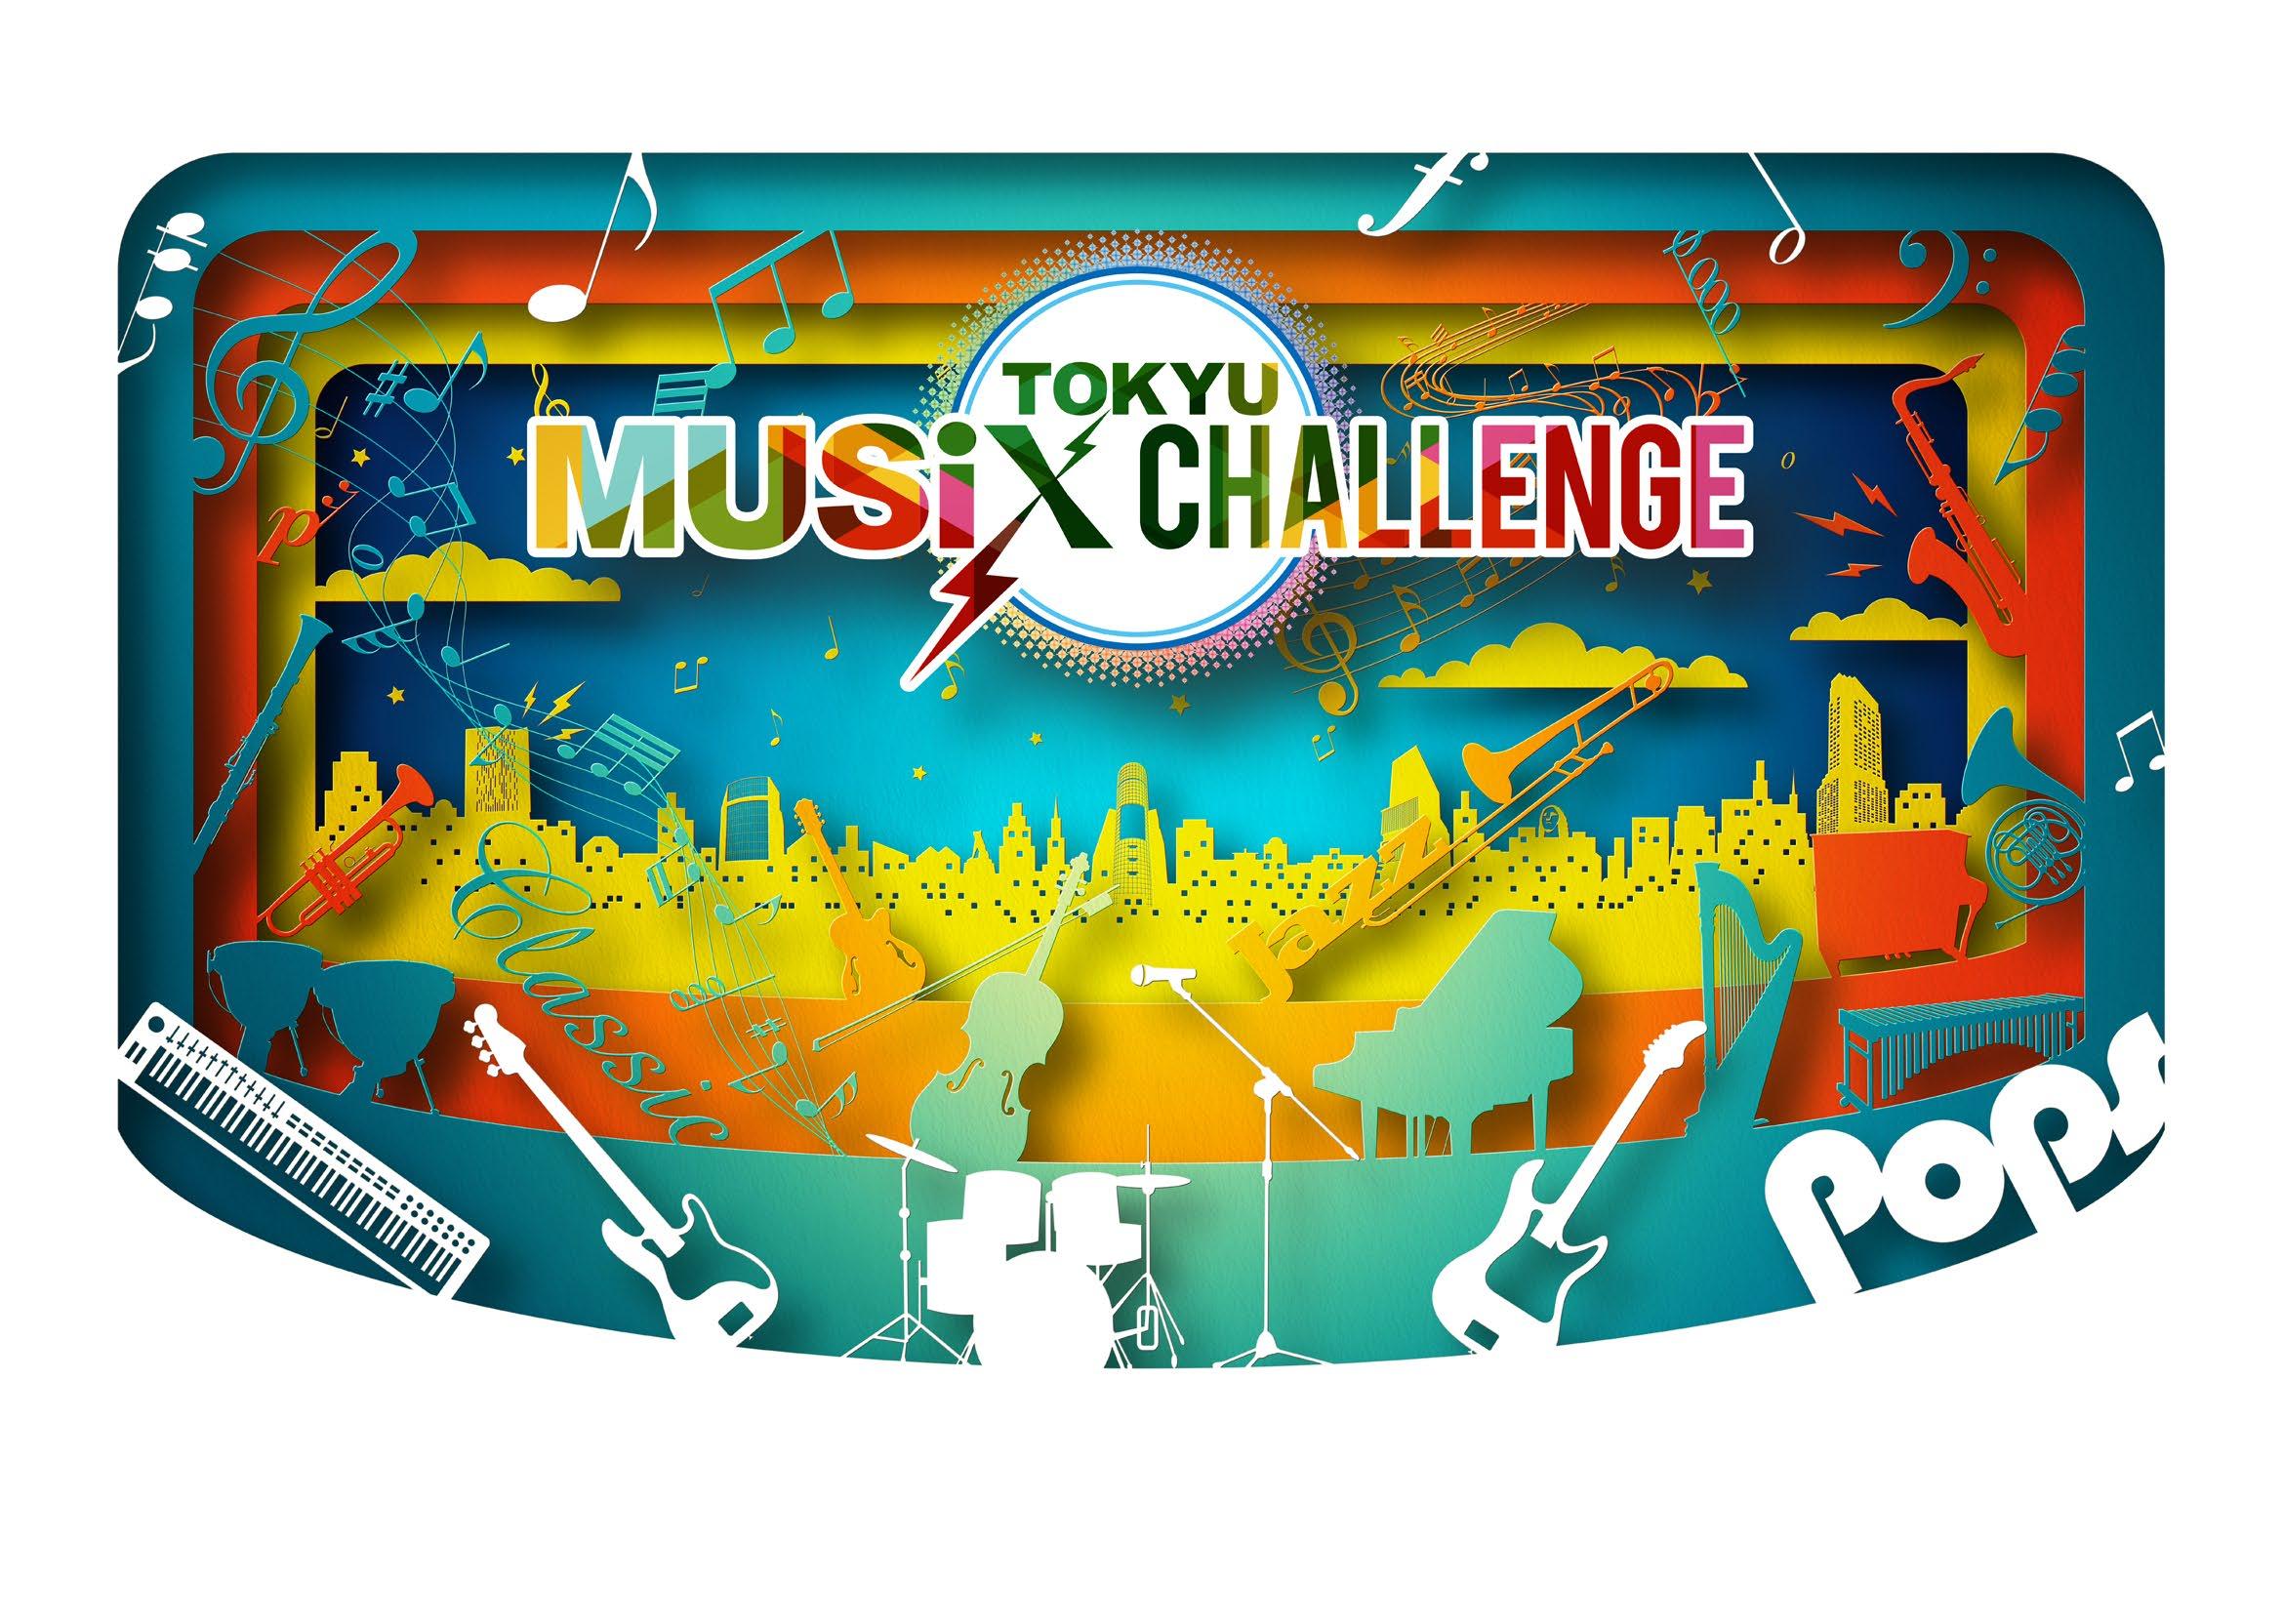 tokyu-musix-challenge-2